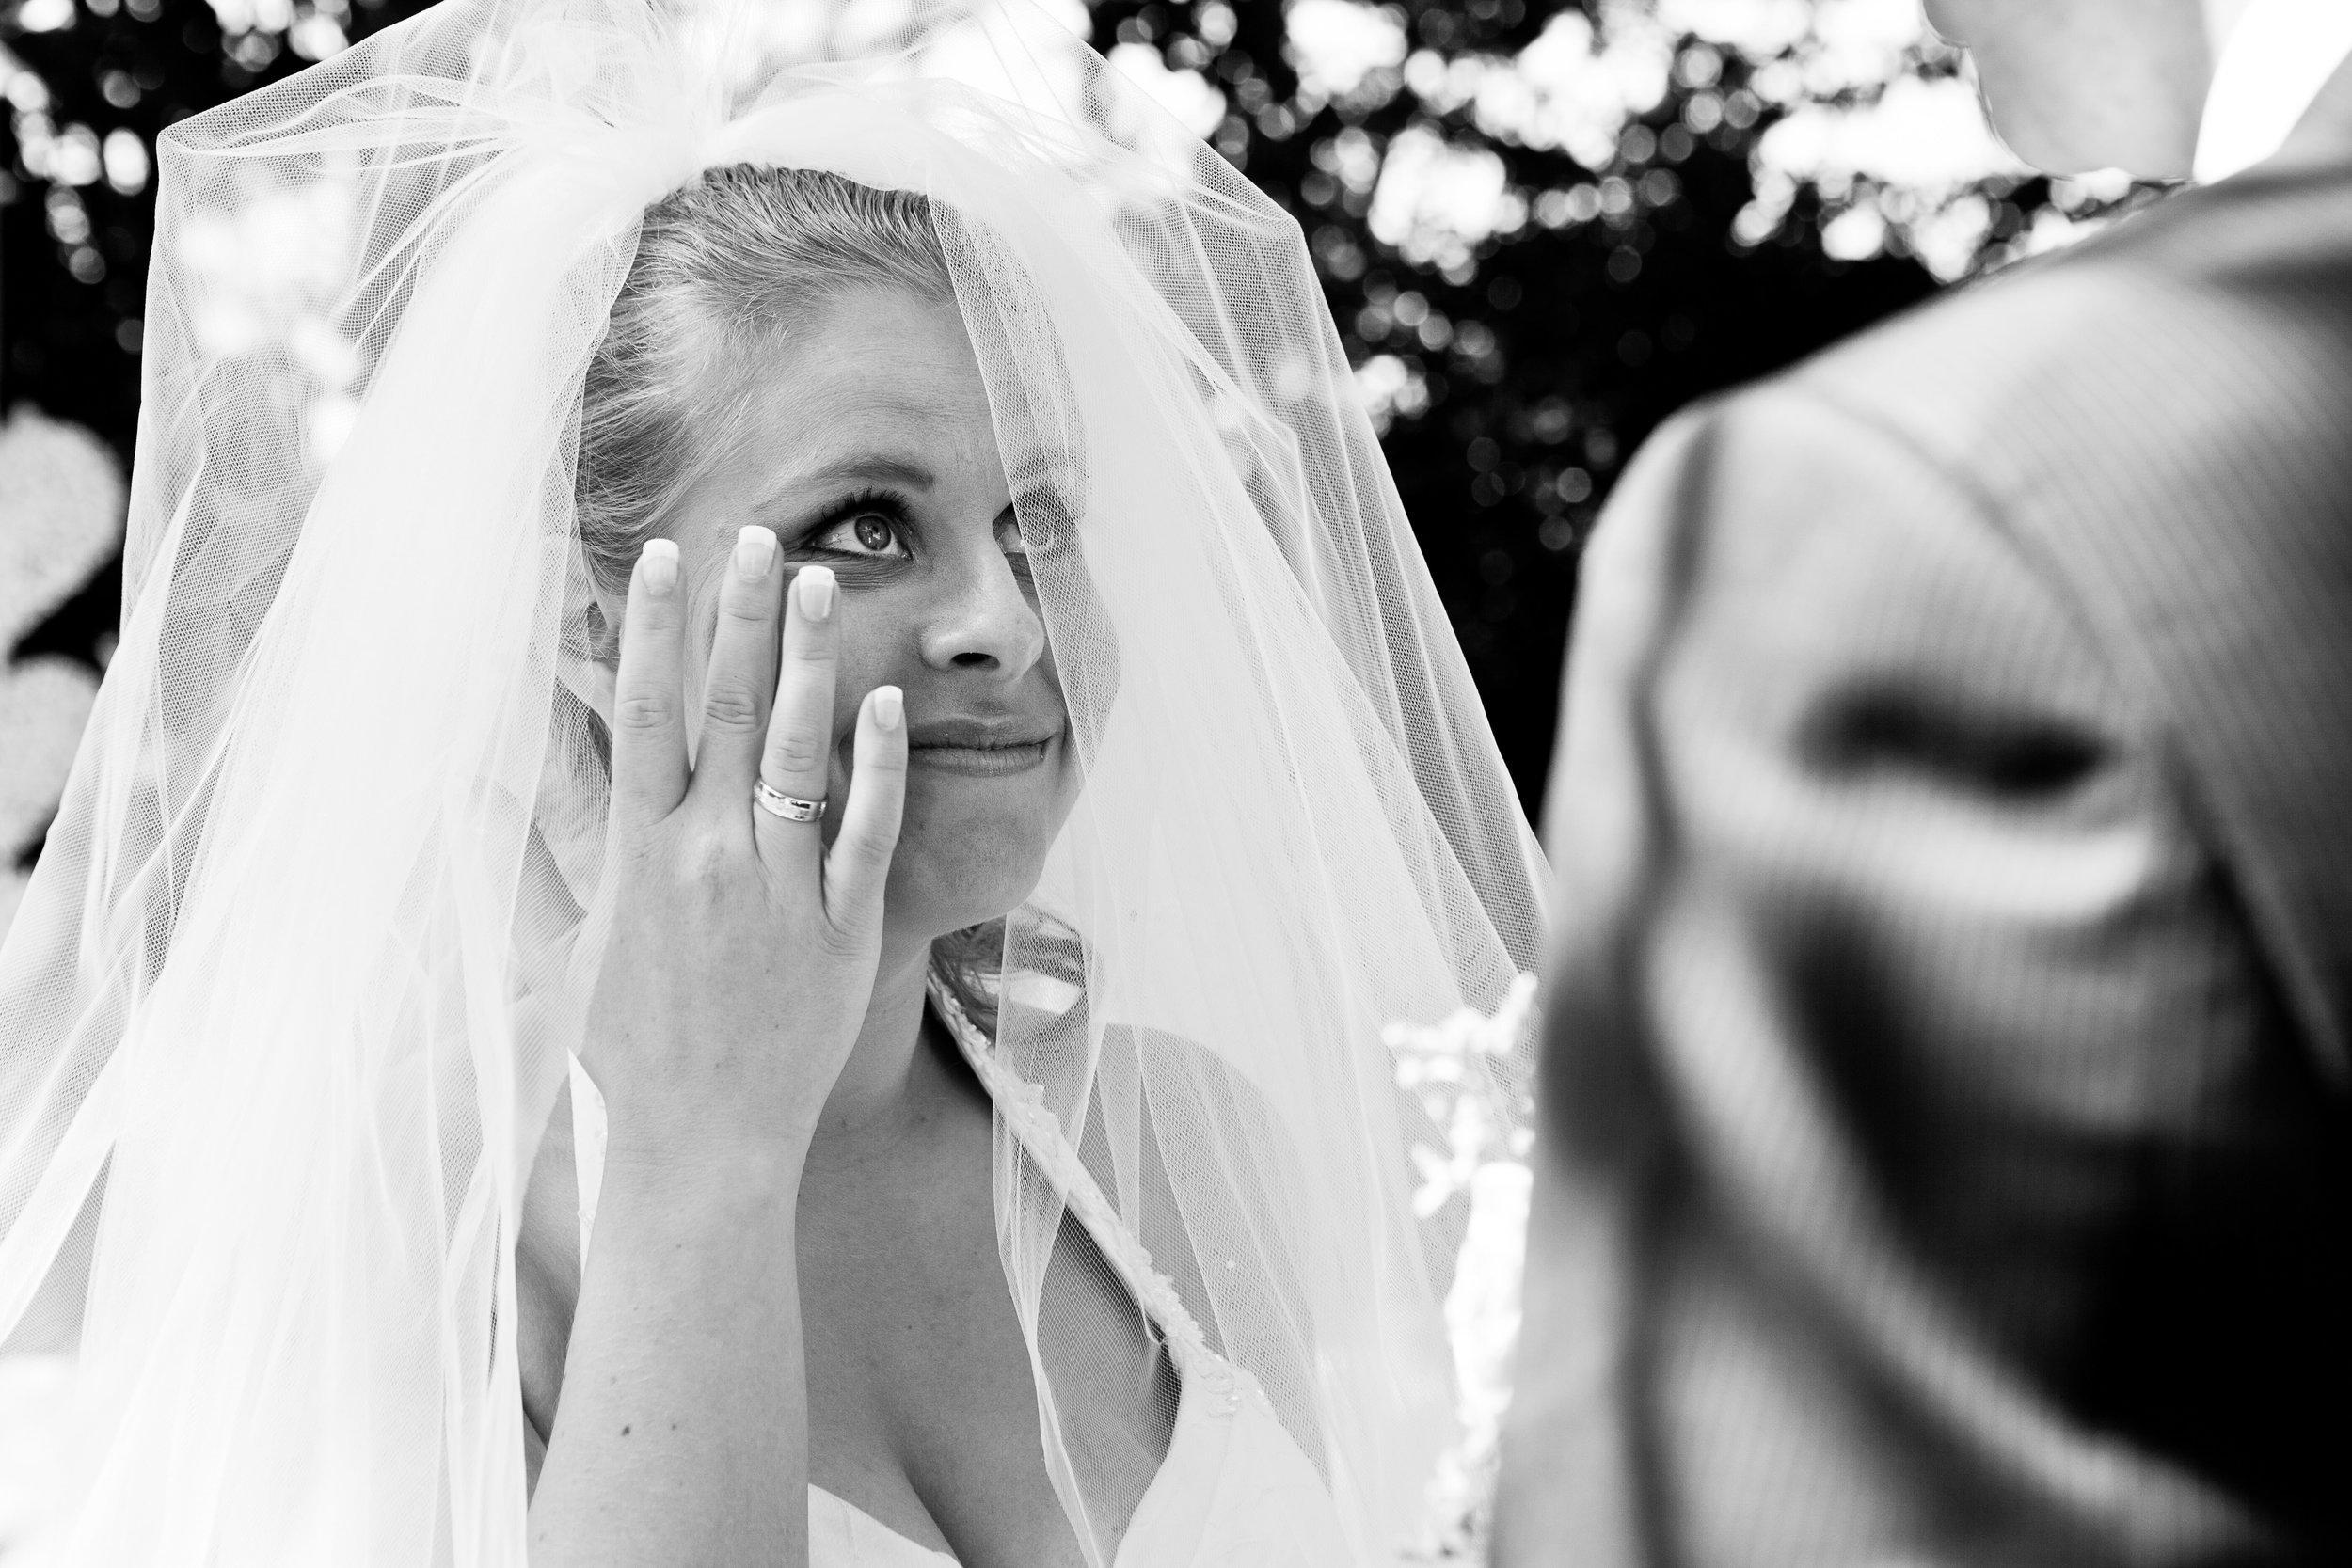 trouwshoot-bruidsfotografie-trouwfoto-feestfotografie-trouwreportage-Laurens en Bettiana566.jpg